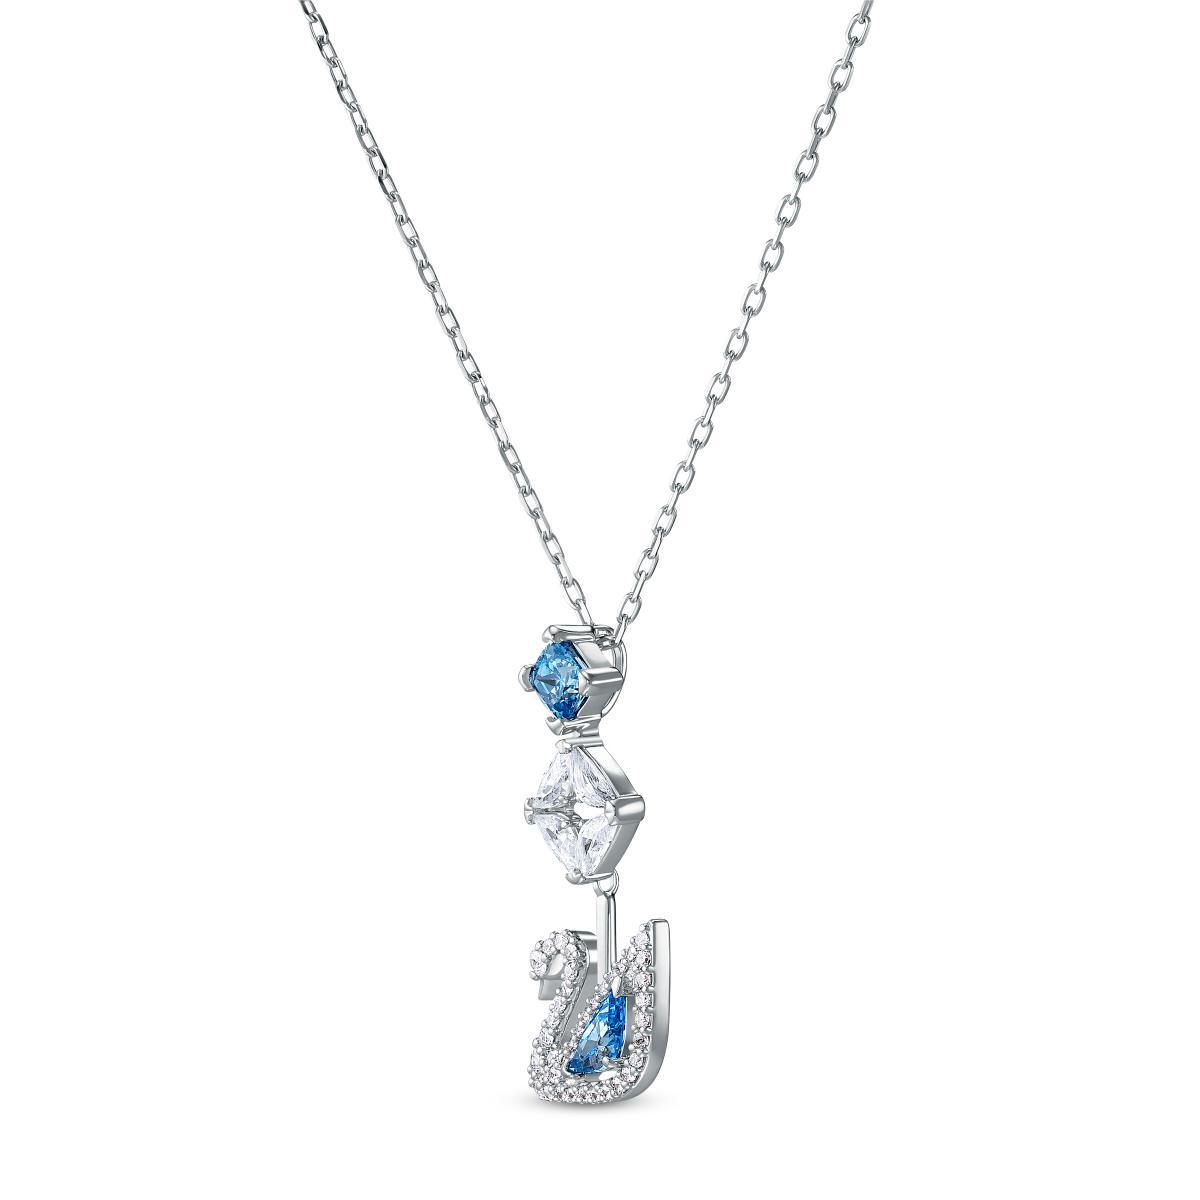 COLLIER Swarovski 5530625 - Collier Métal Argenté Cygne et Cristal Bleu  Strass Blanc Femme